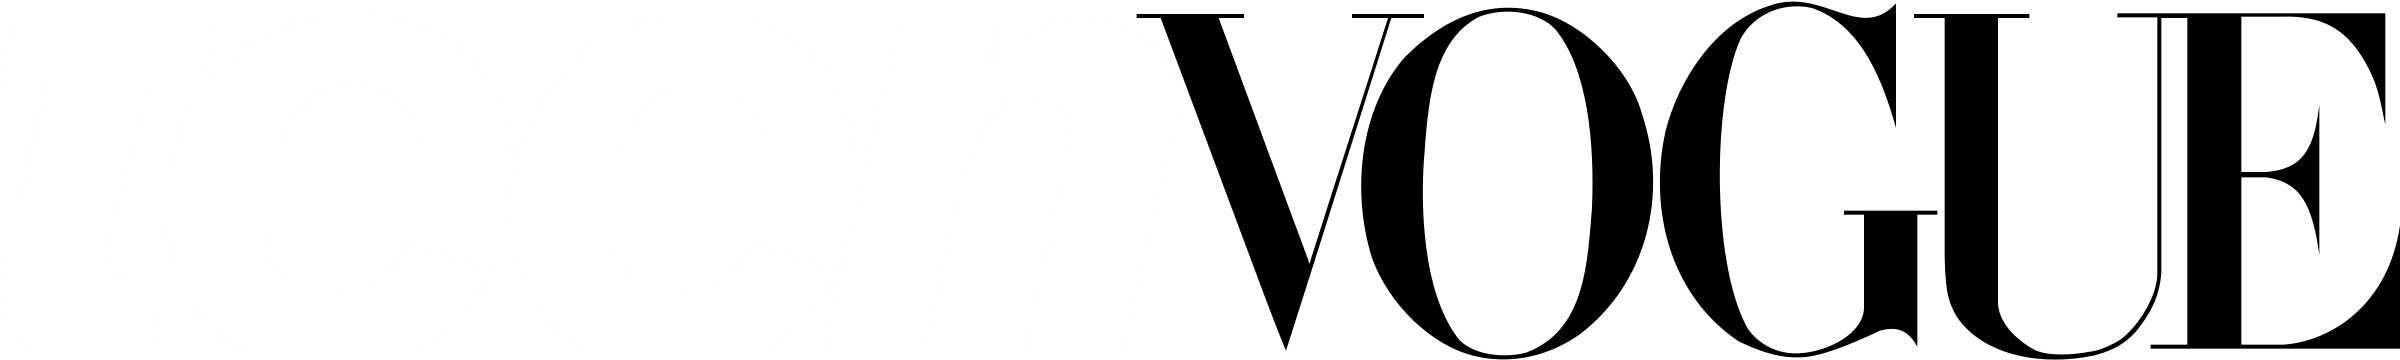 TEEN Vogue Logo PNG Transparent & SVG Vector.